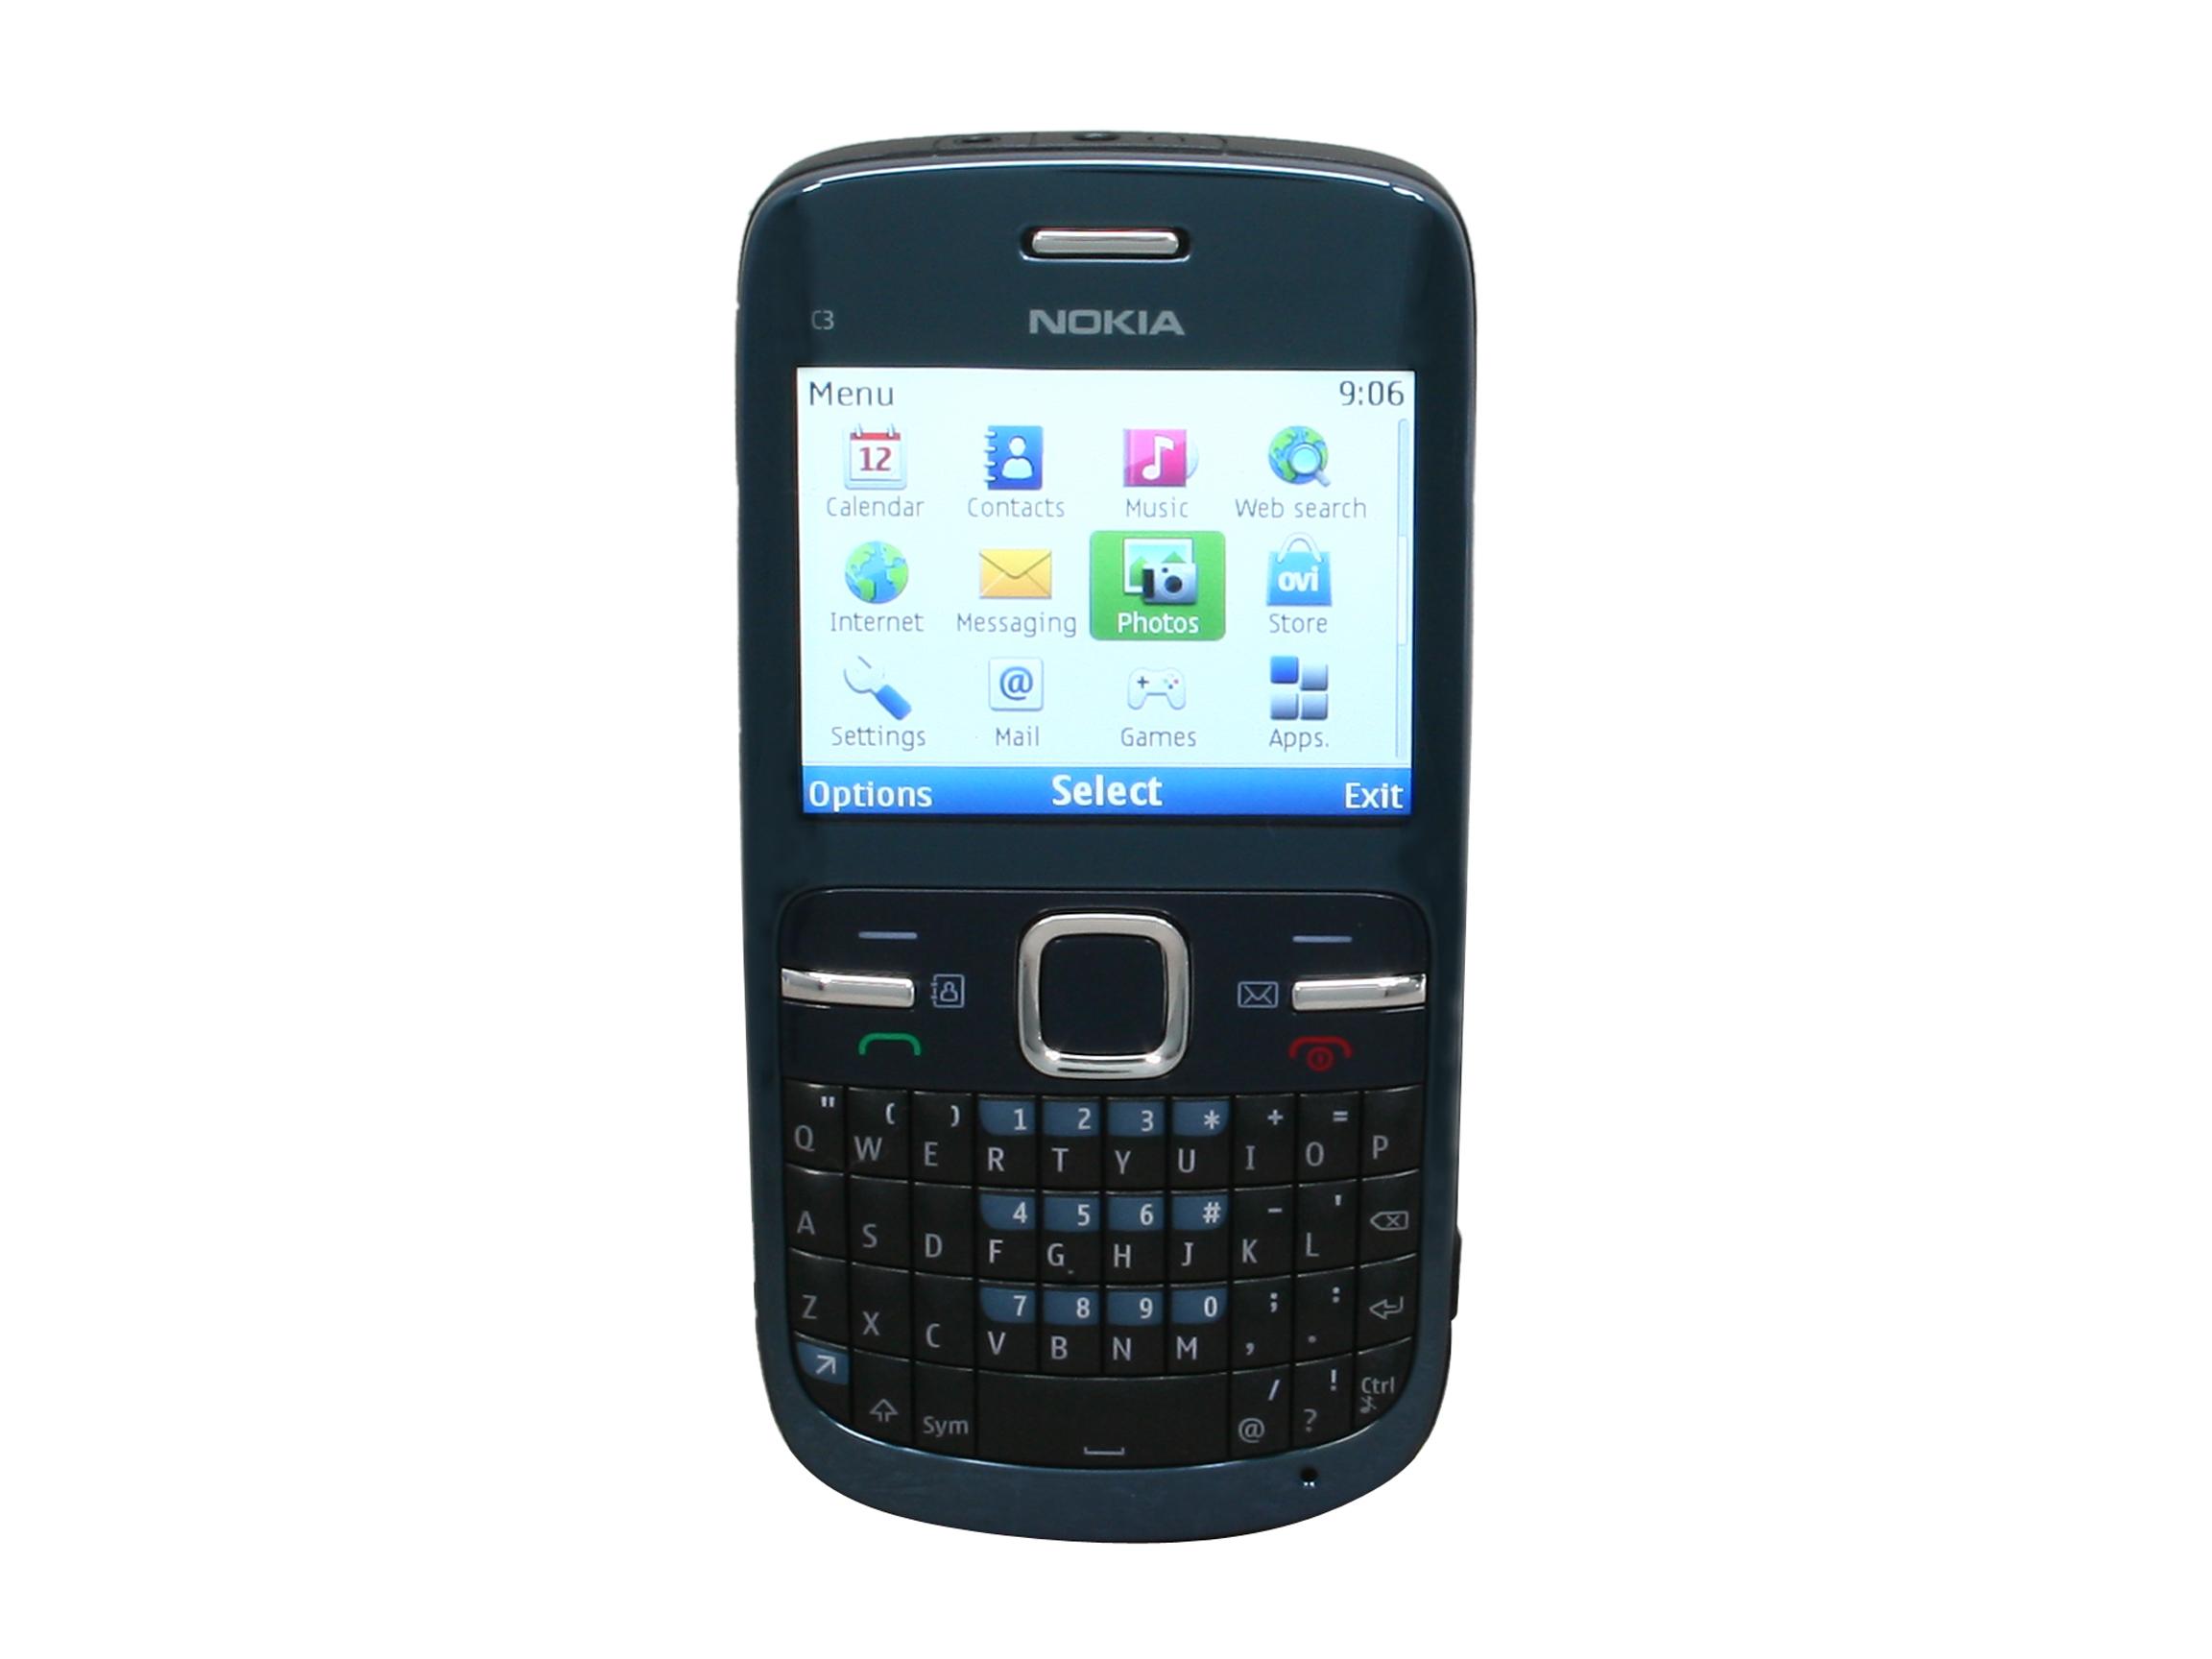 Nokia C3 00 Blue Unlocked GSM Phone w/ Full QWERTY Keyboard / Wi Fi / 2.0 MP Camera / Bluetooth v2.1  (C3 00)